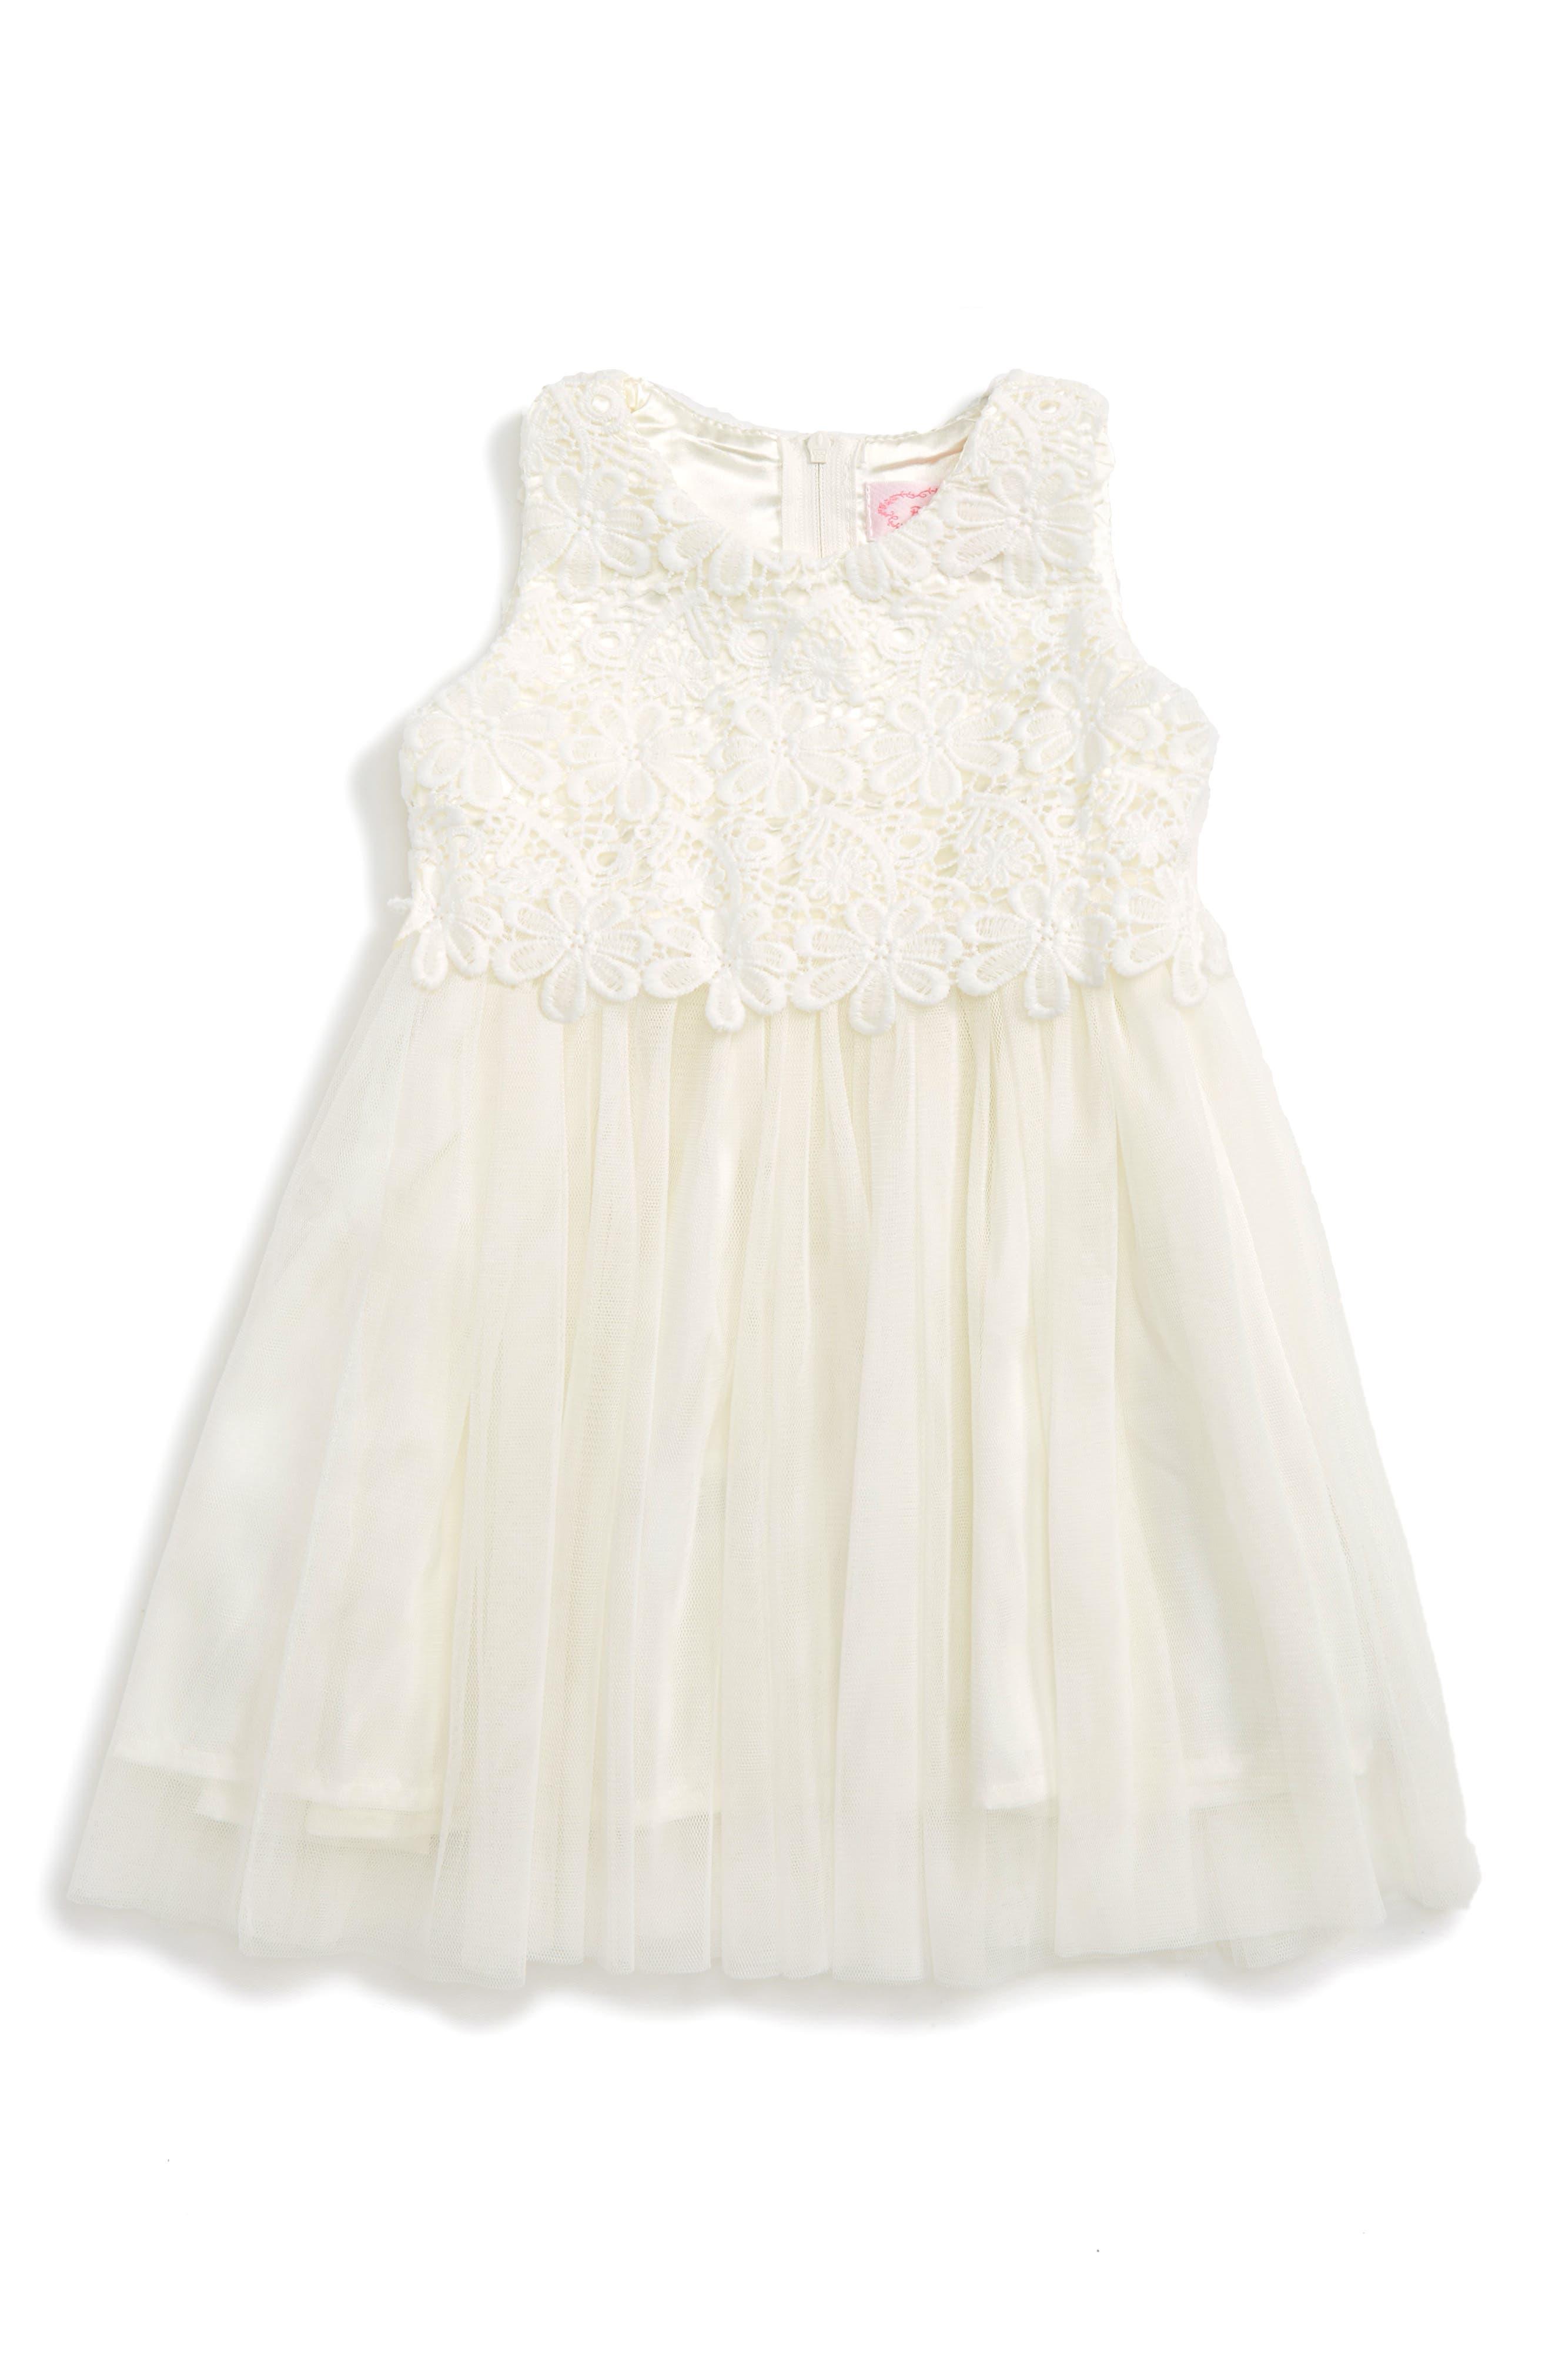 Main Image - Popatu Lace & Tulle Dress (Baby Girls)